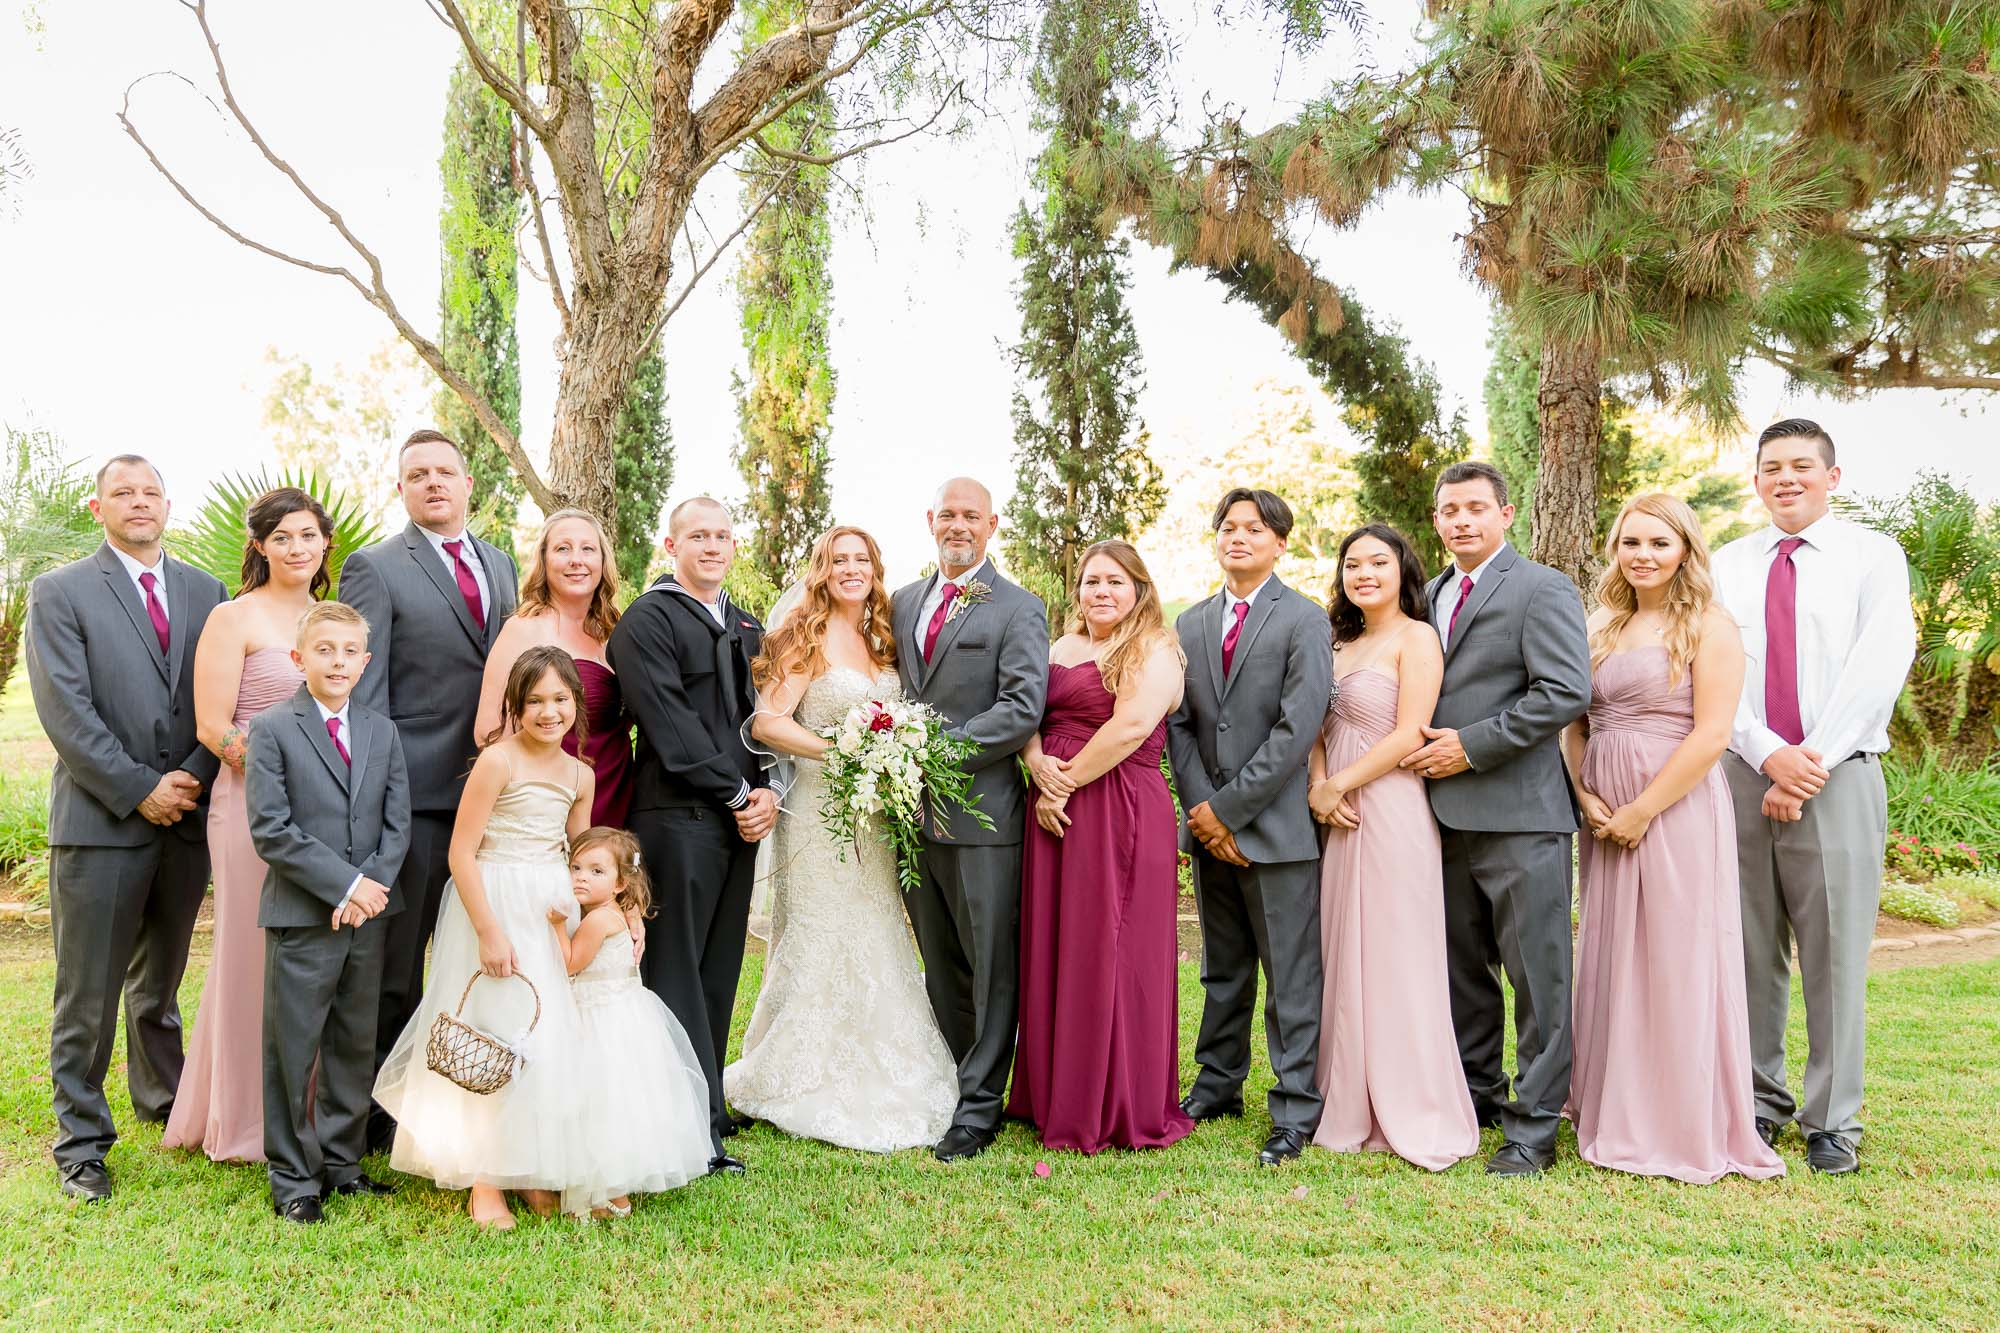 Heather_Pat_San_Marcos_Lakehouse_Wedding_458.jpg